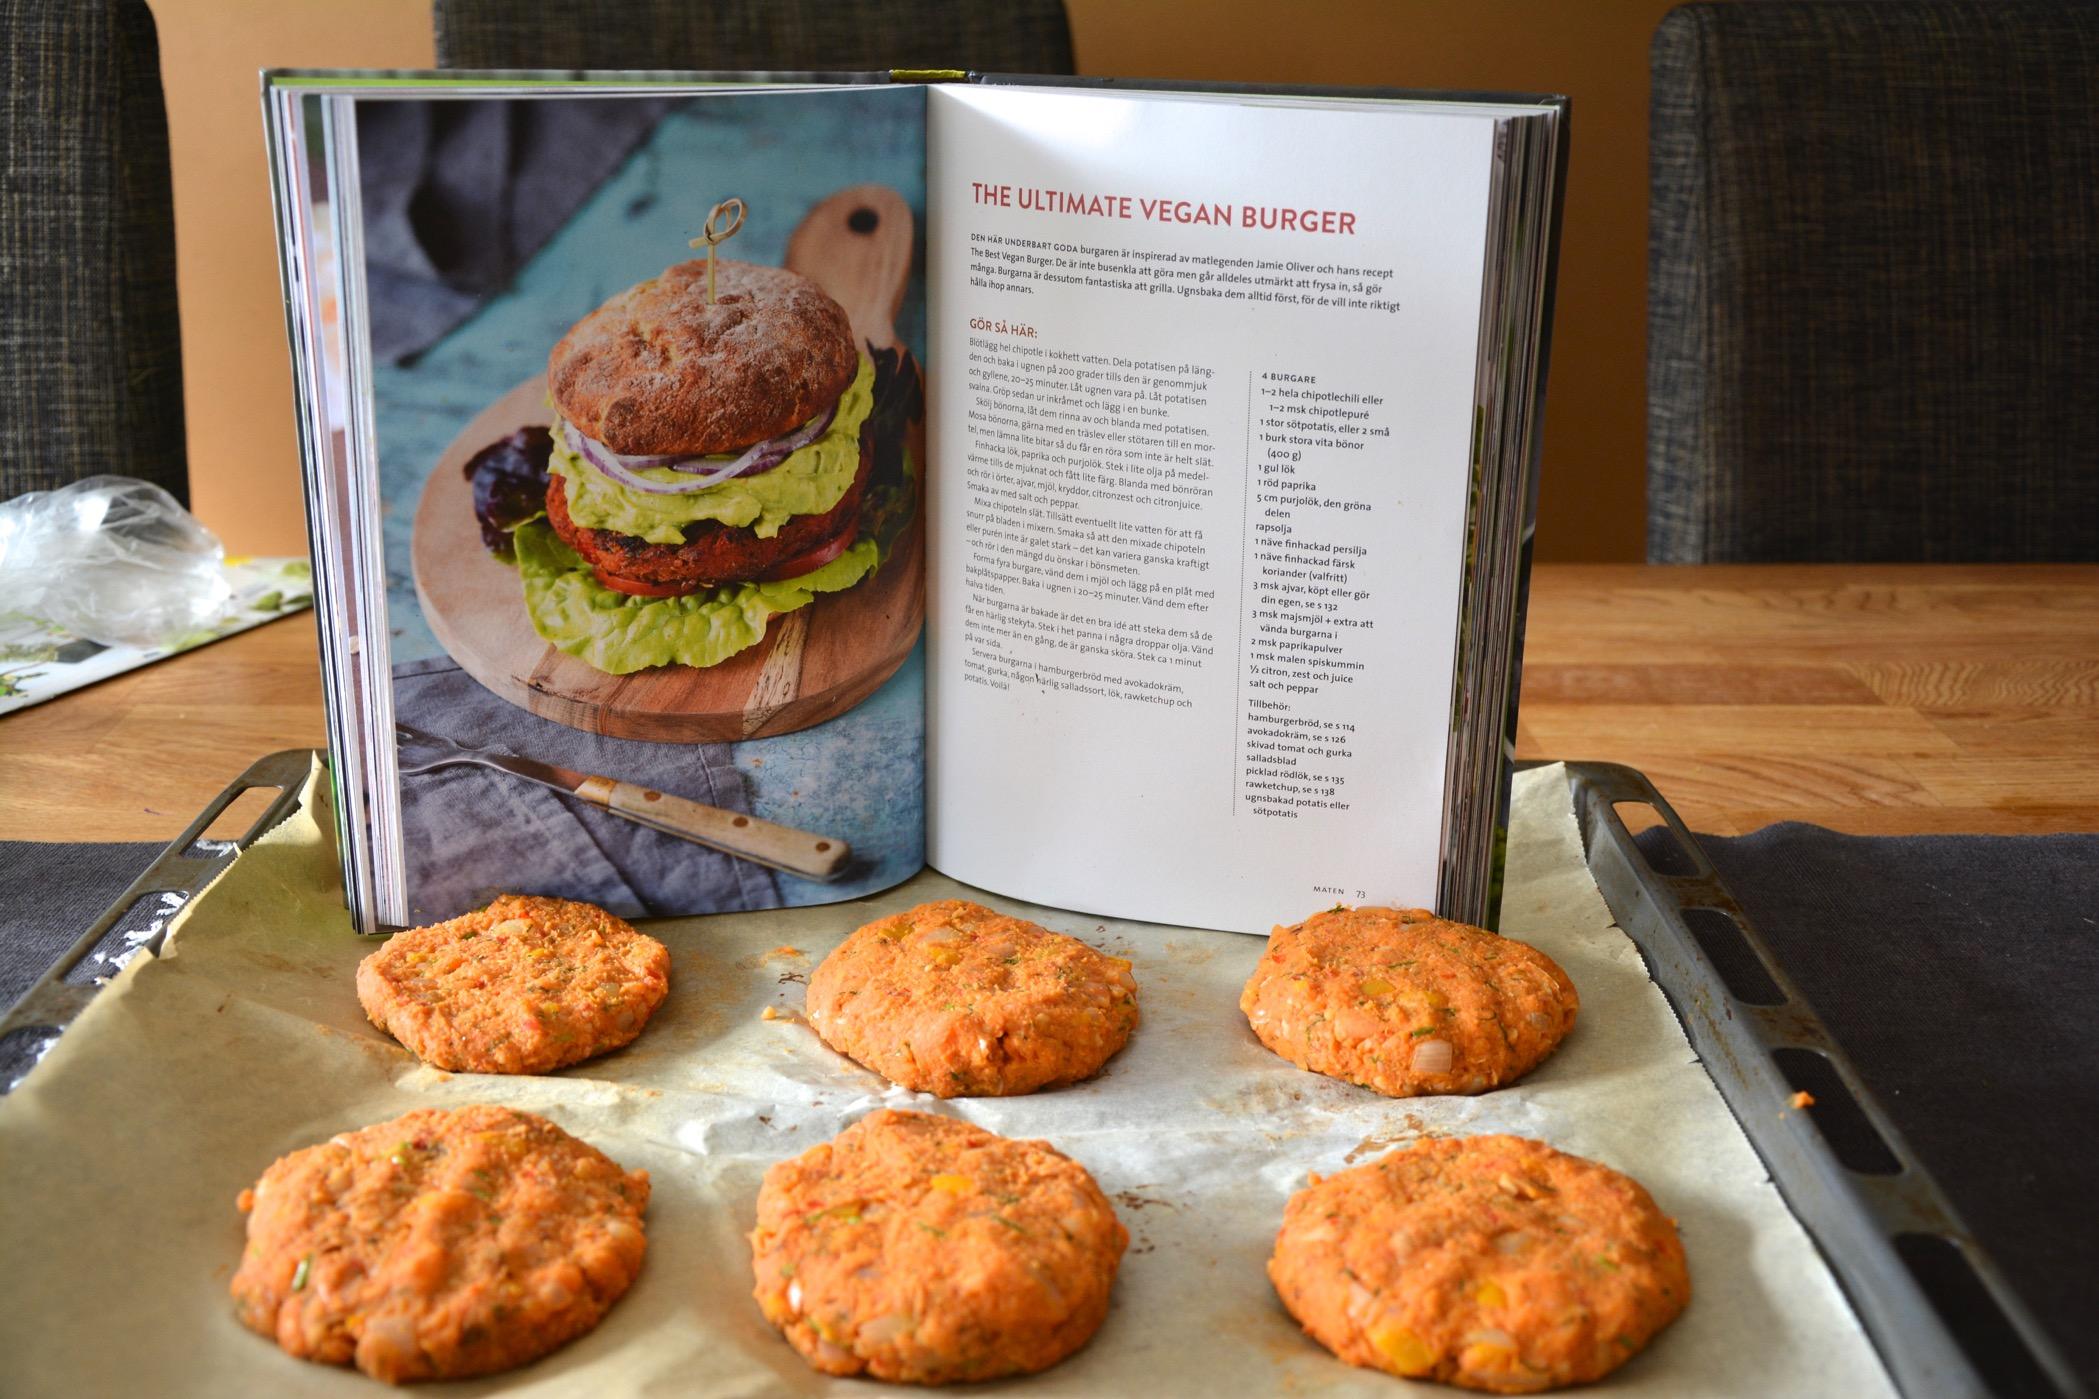 sötpotatis recept vegan